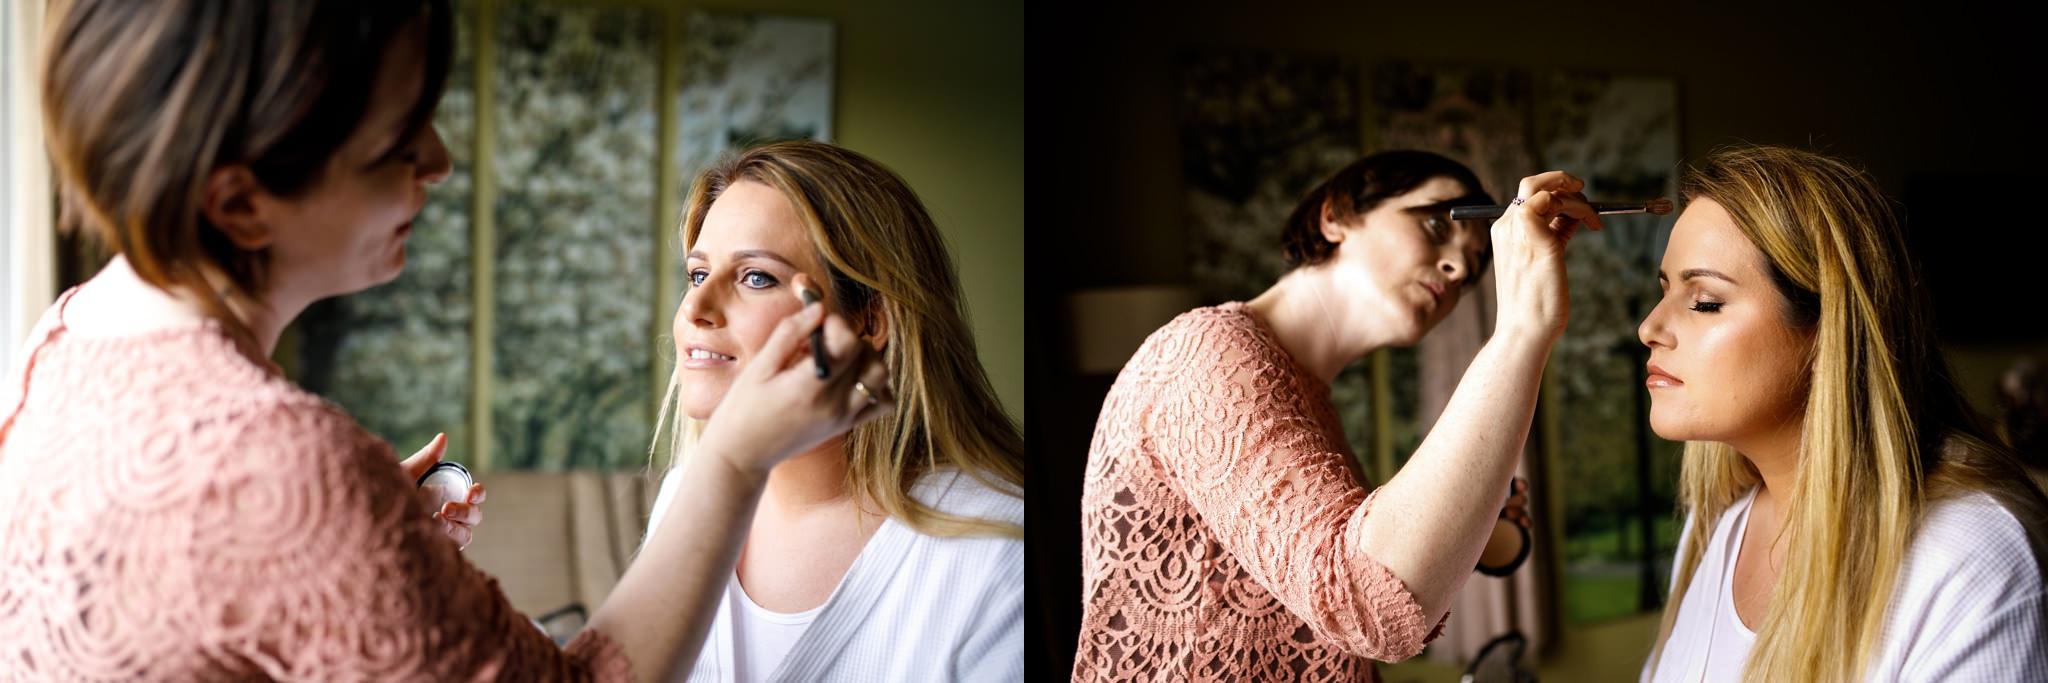 Elisha-Clarke-Photography_0008-1.jpg